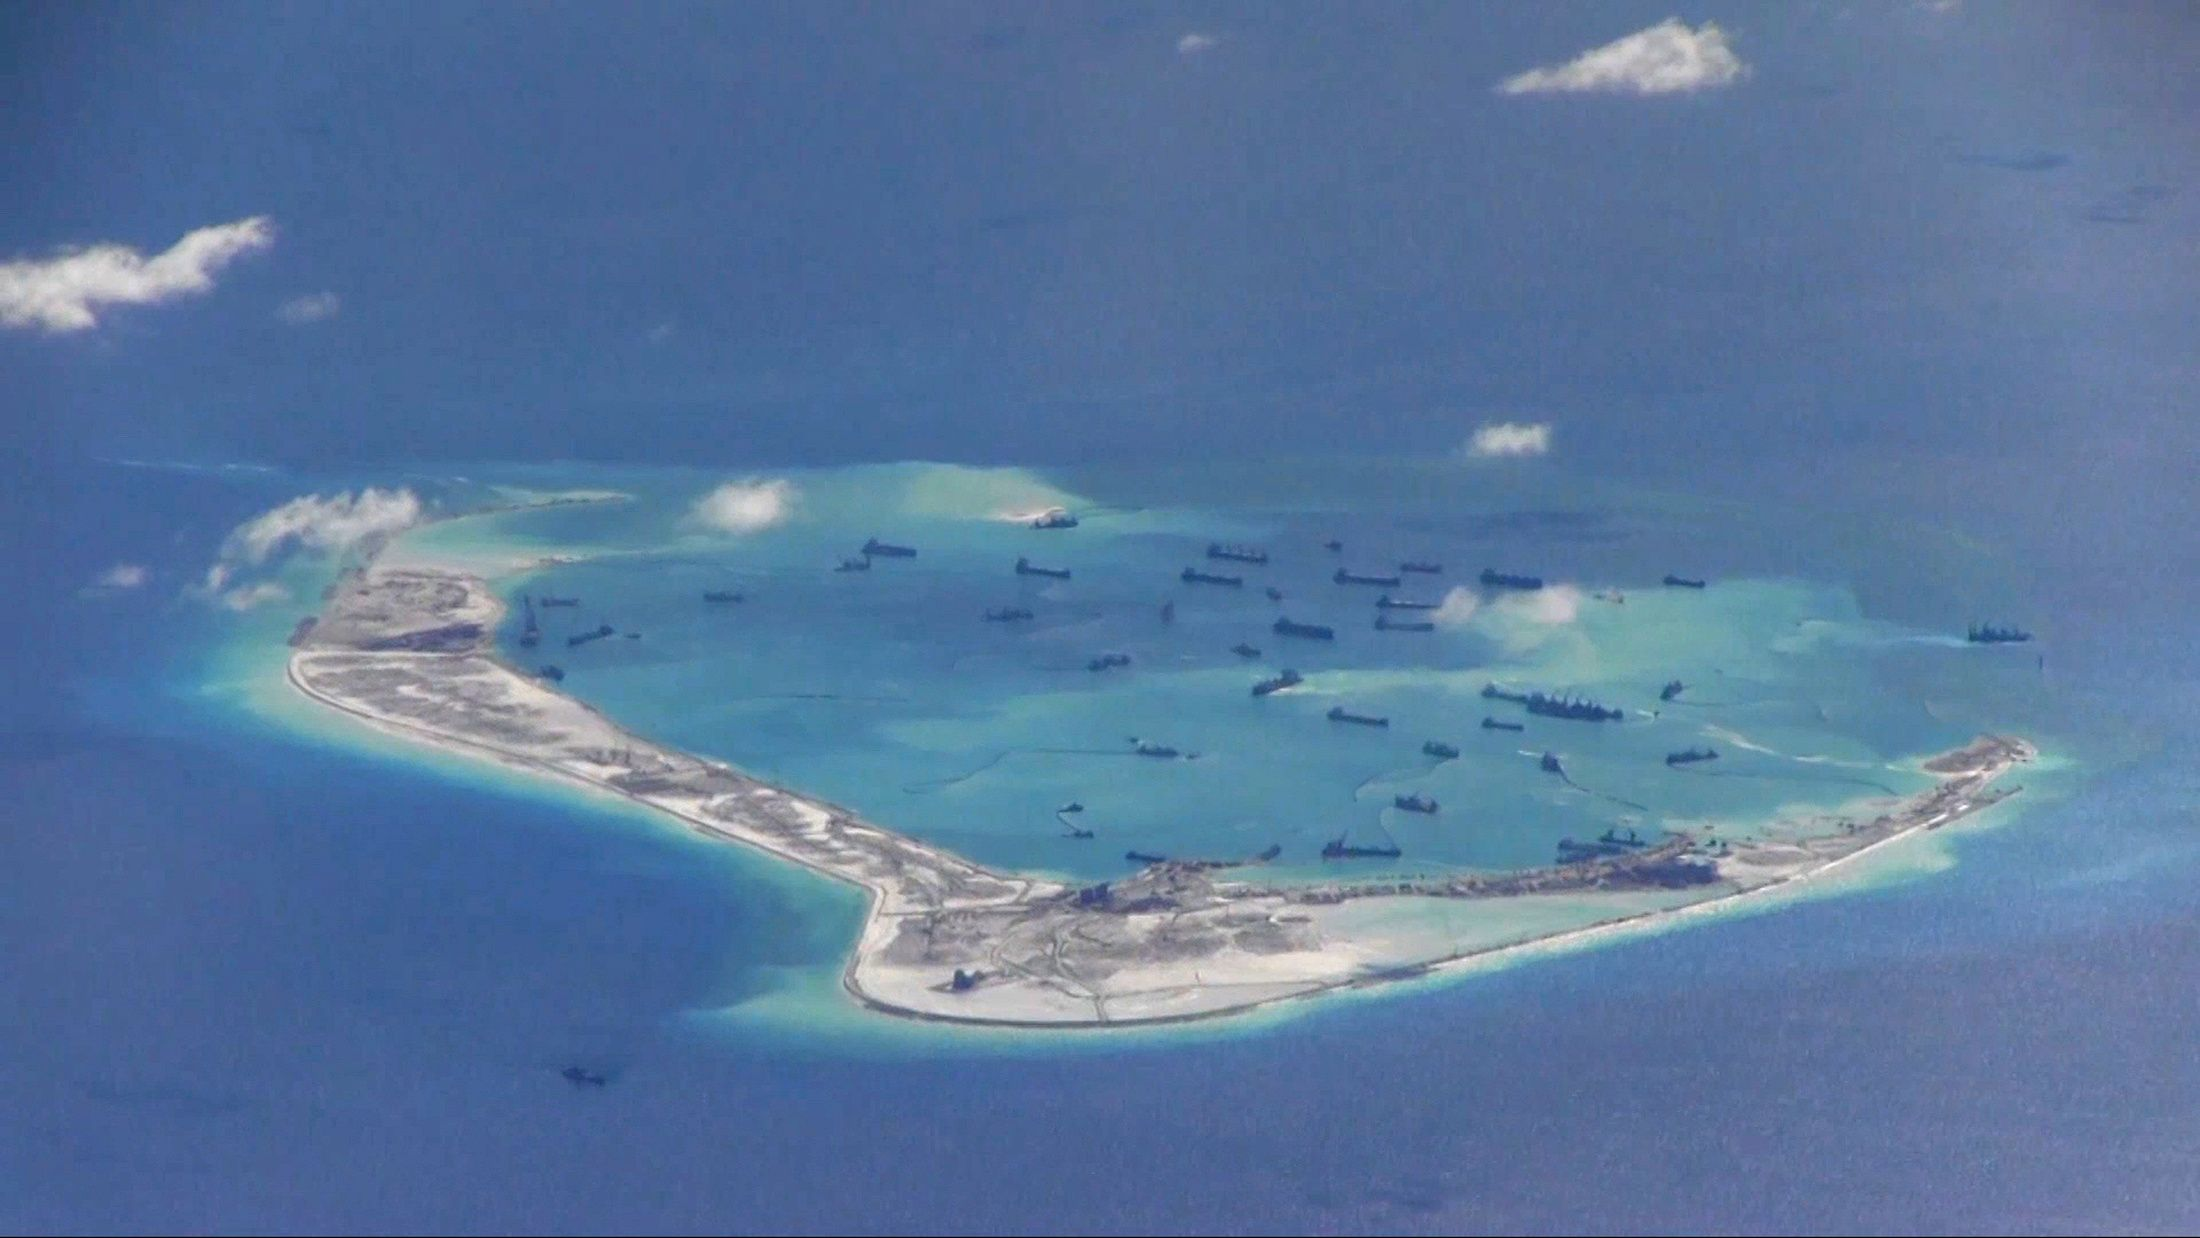 South China Sea Island